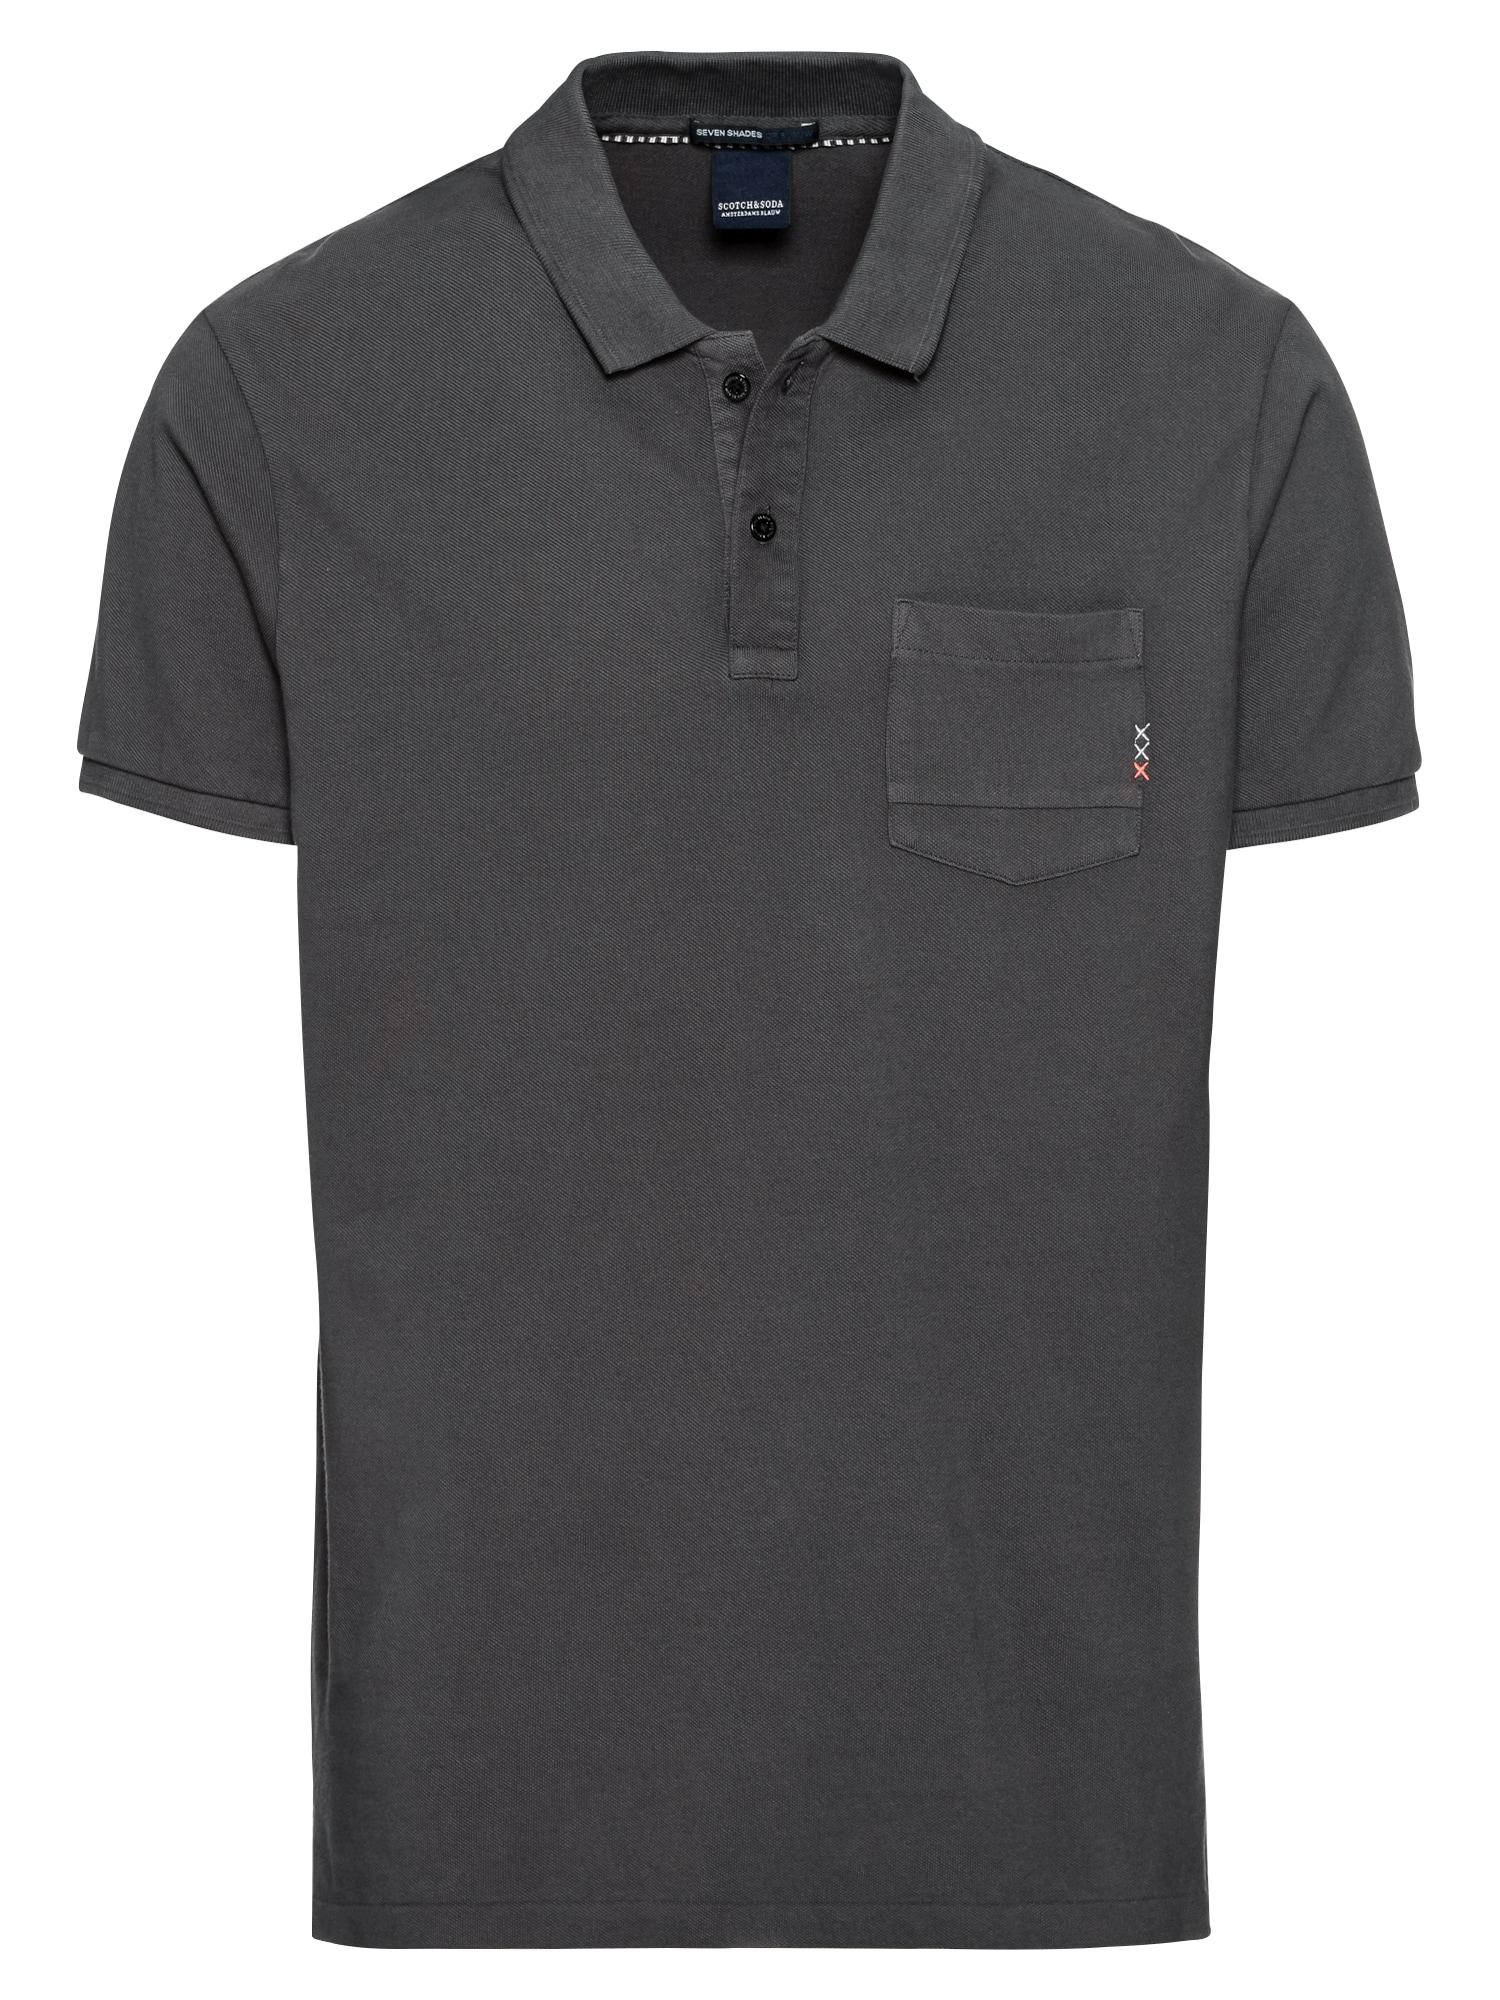 SCOTCH  and  SODA Heren Shirt Ams Blauw garment dyed polo with XXX pocket antrac